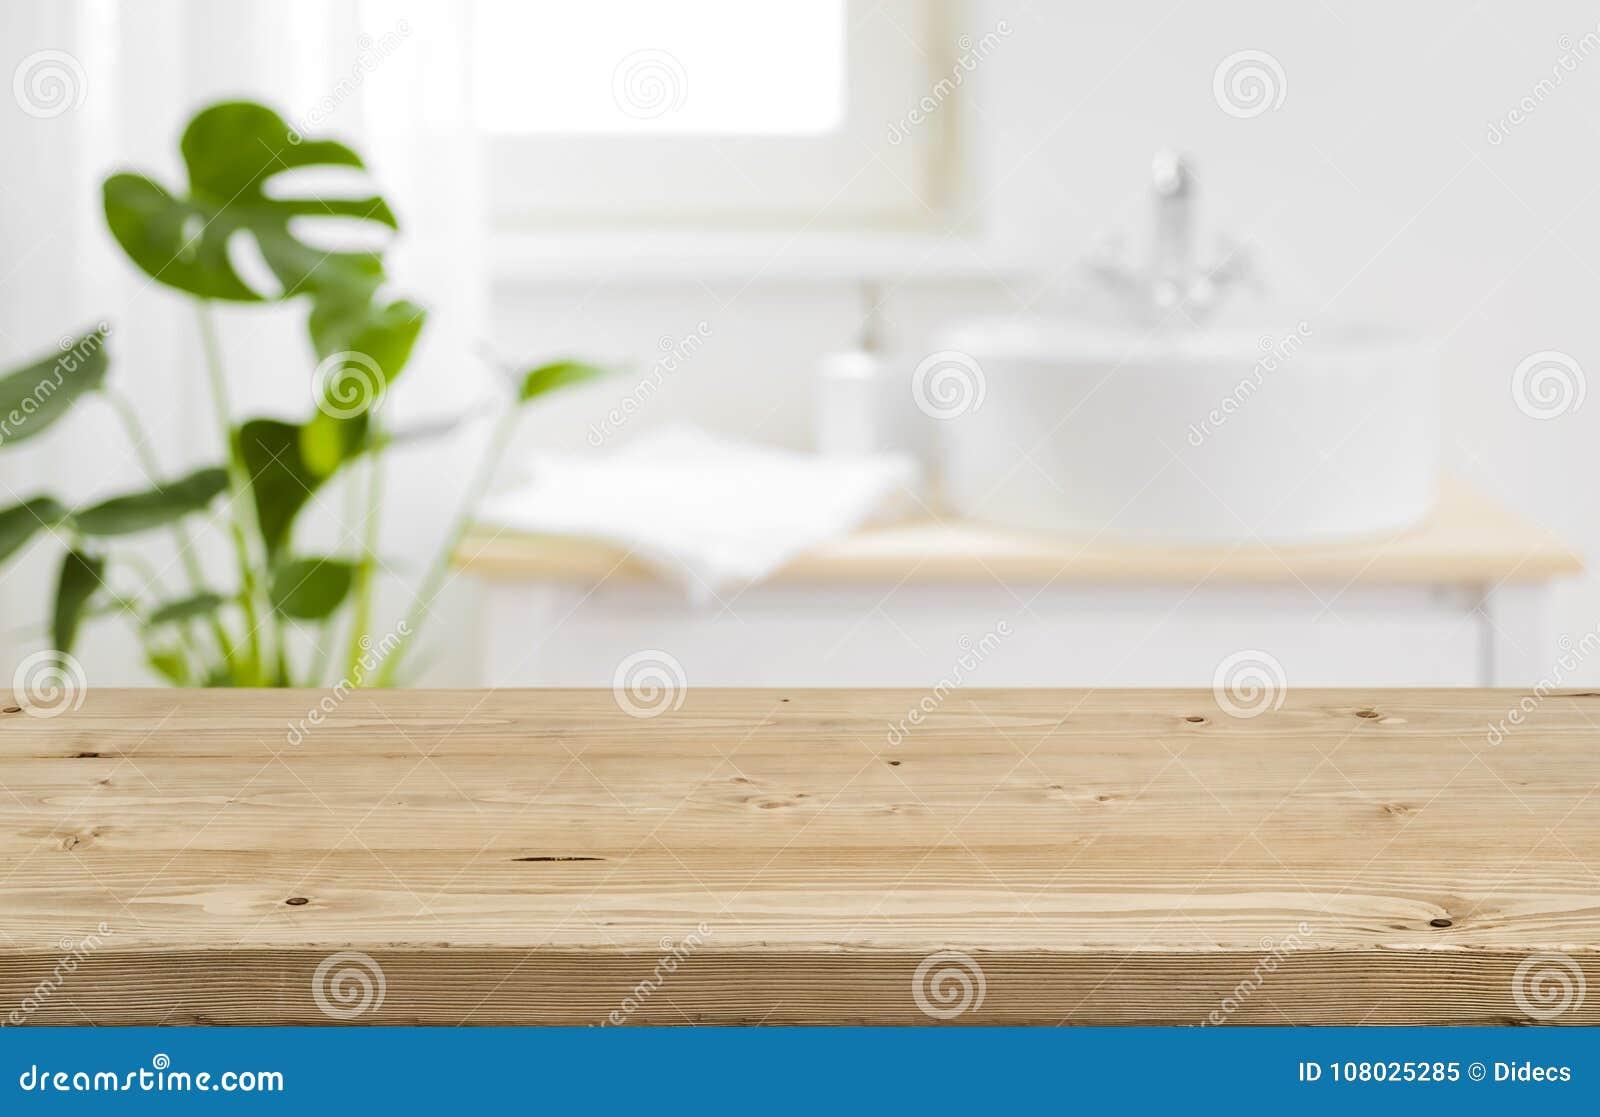 Leeg tafelblad voor productvertoning met vage badkamers binnenlandse achtergrond